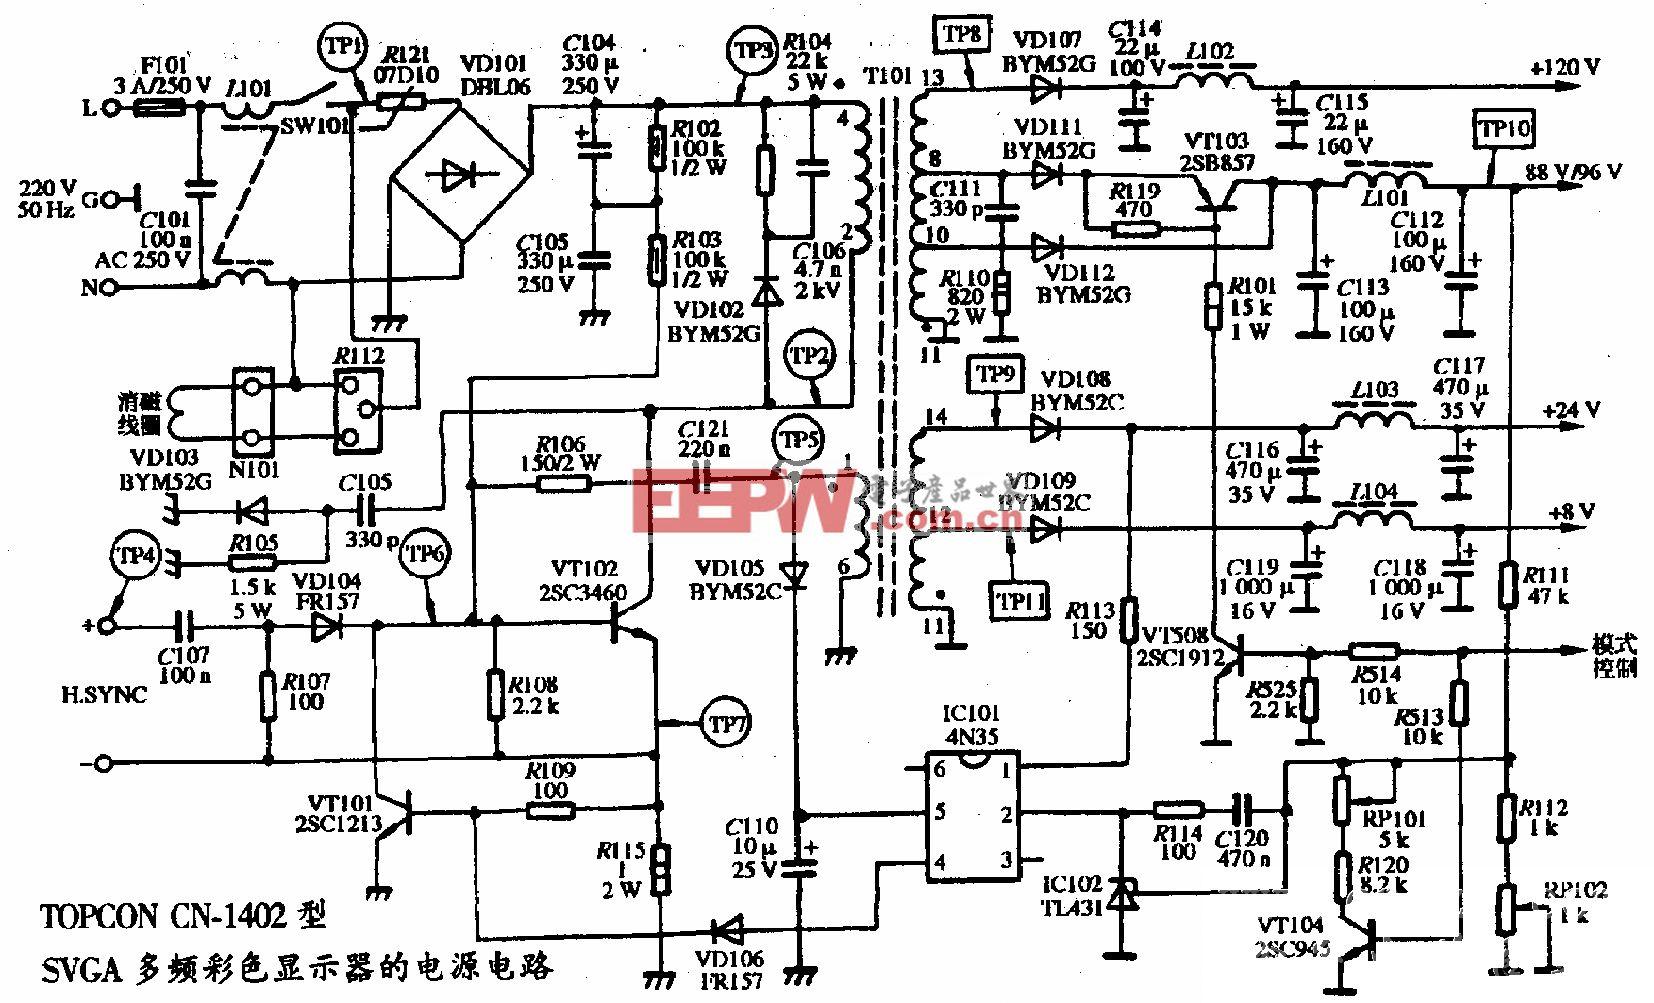 TOPCON CN-1402型SVGA彩色显示器的电源电路图